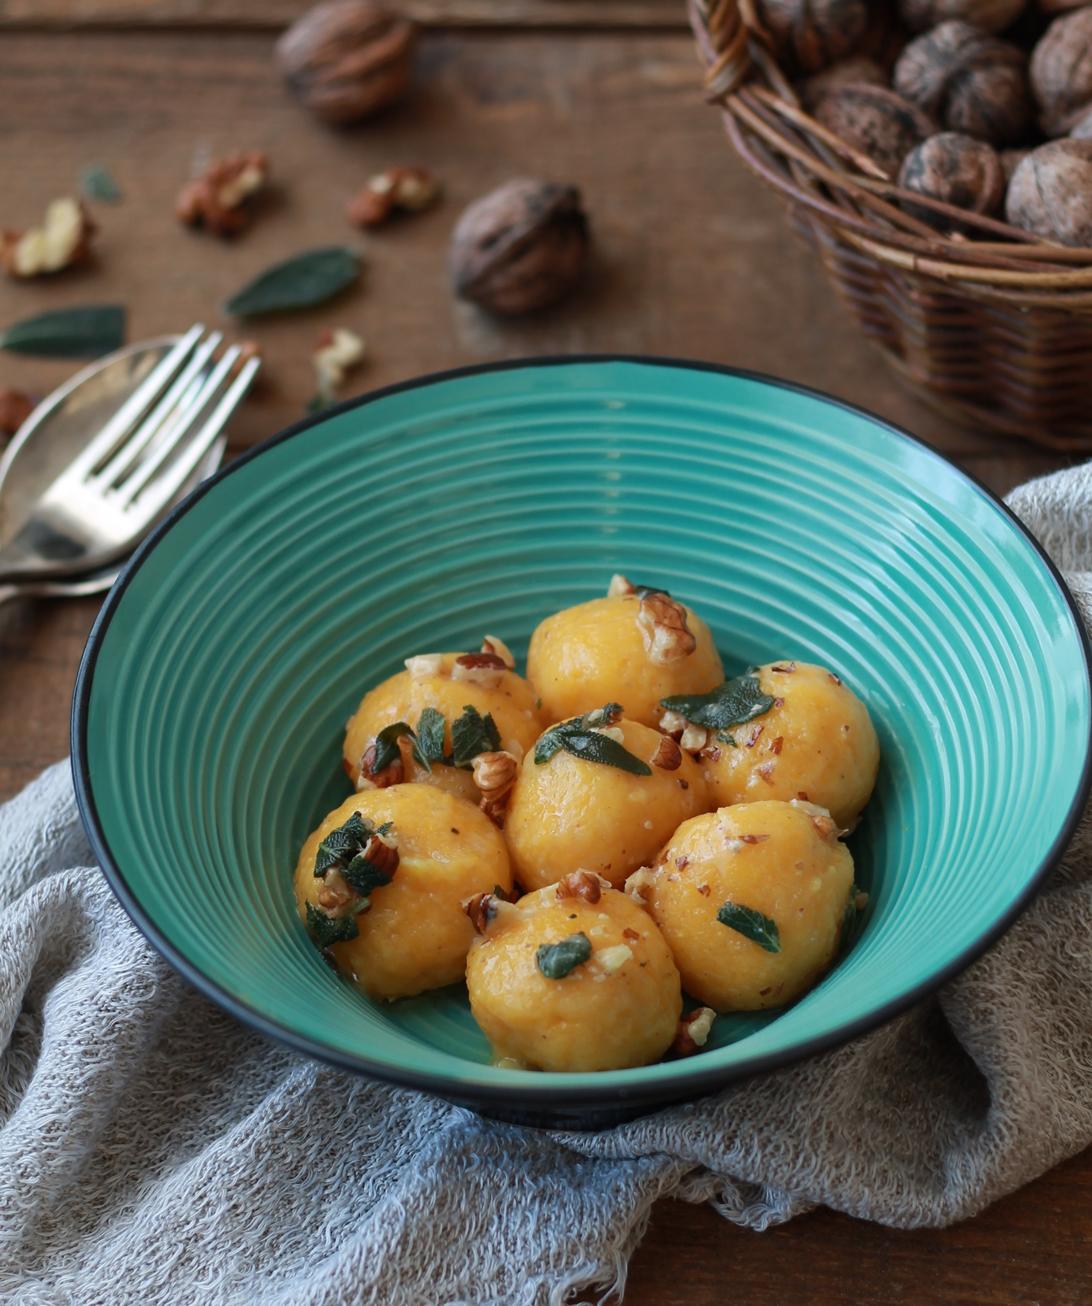 Canederli de potiron sans gluten - La Cassata Celiaca